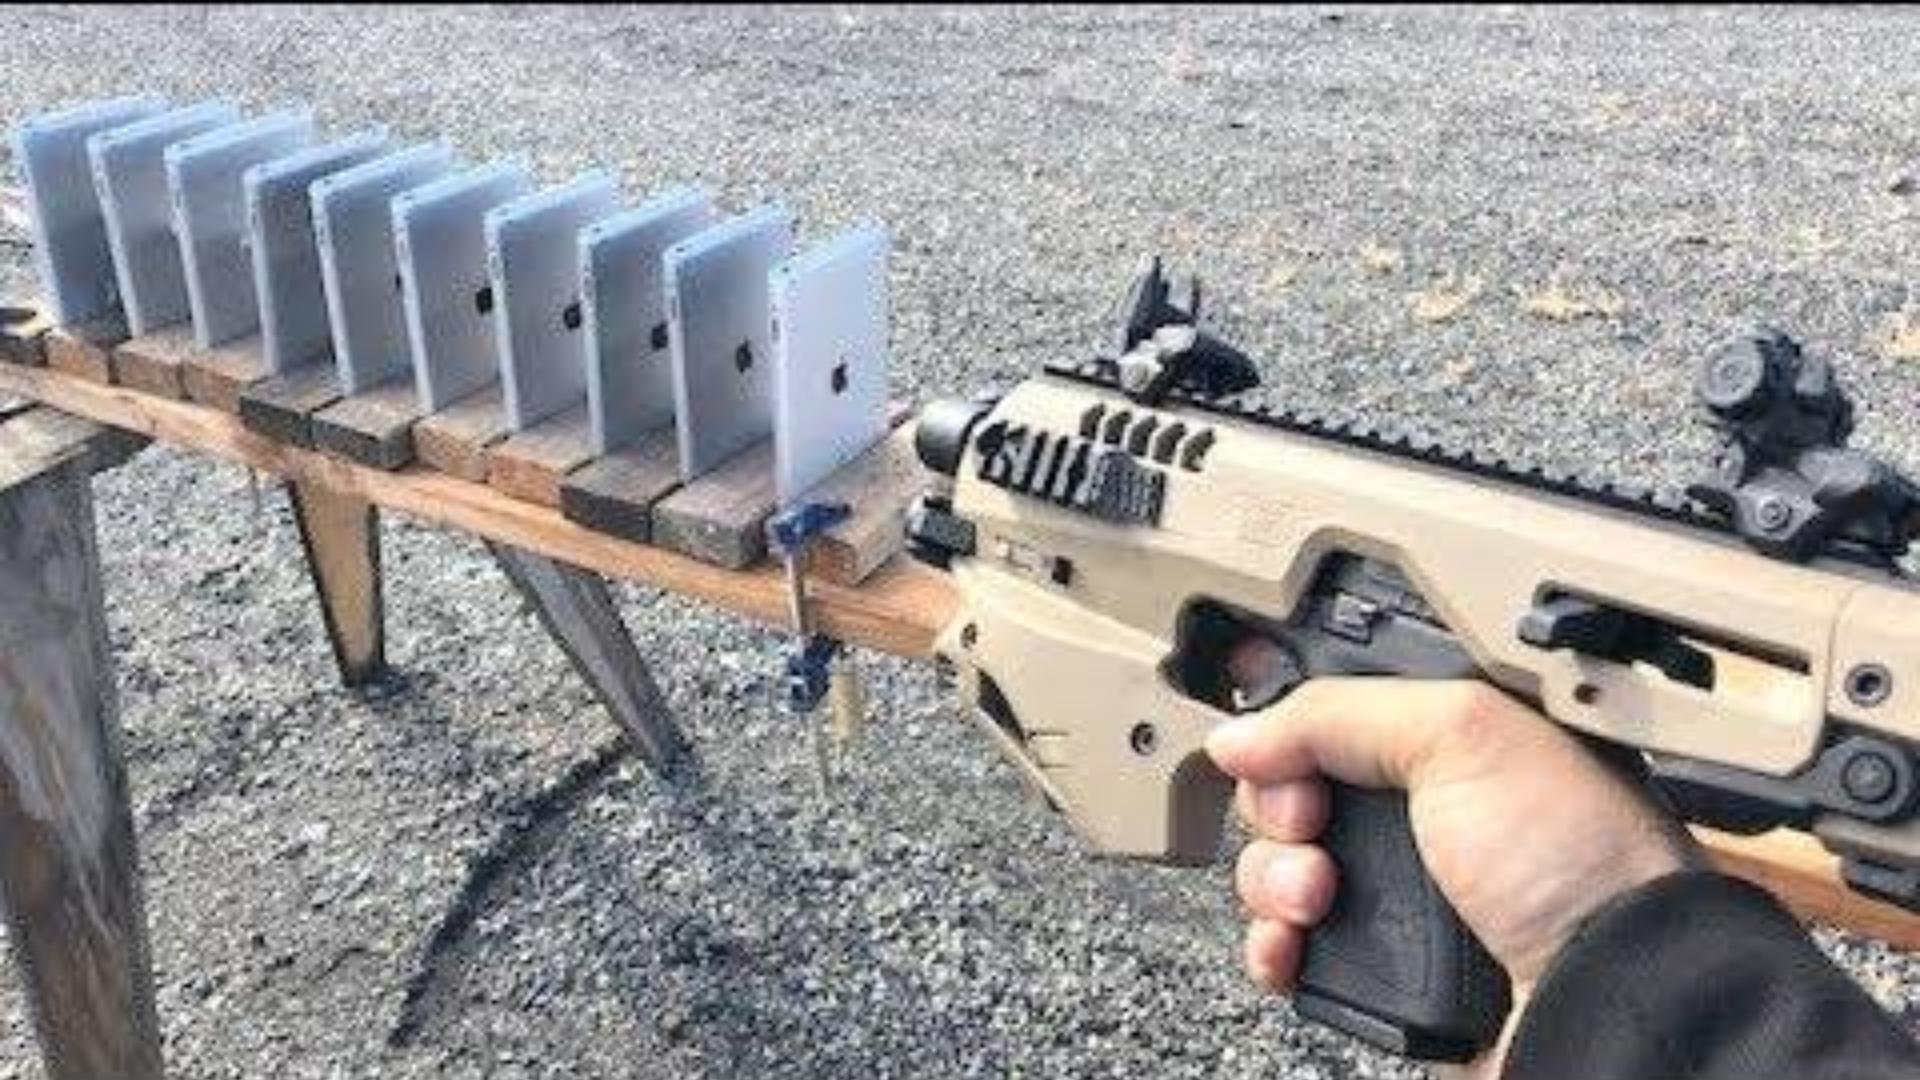 [Edwin Sarkissian]测试需要多少iPad才能挡住子弹